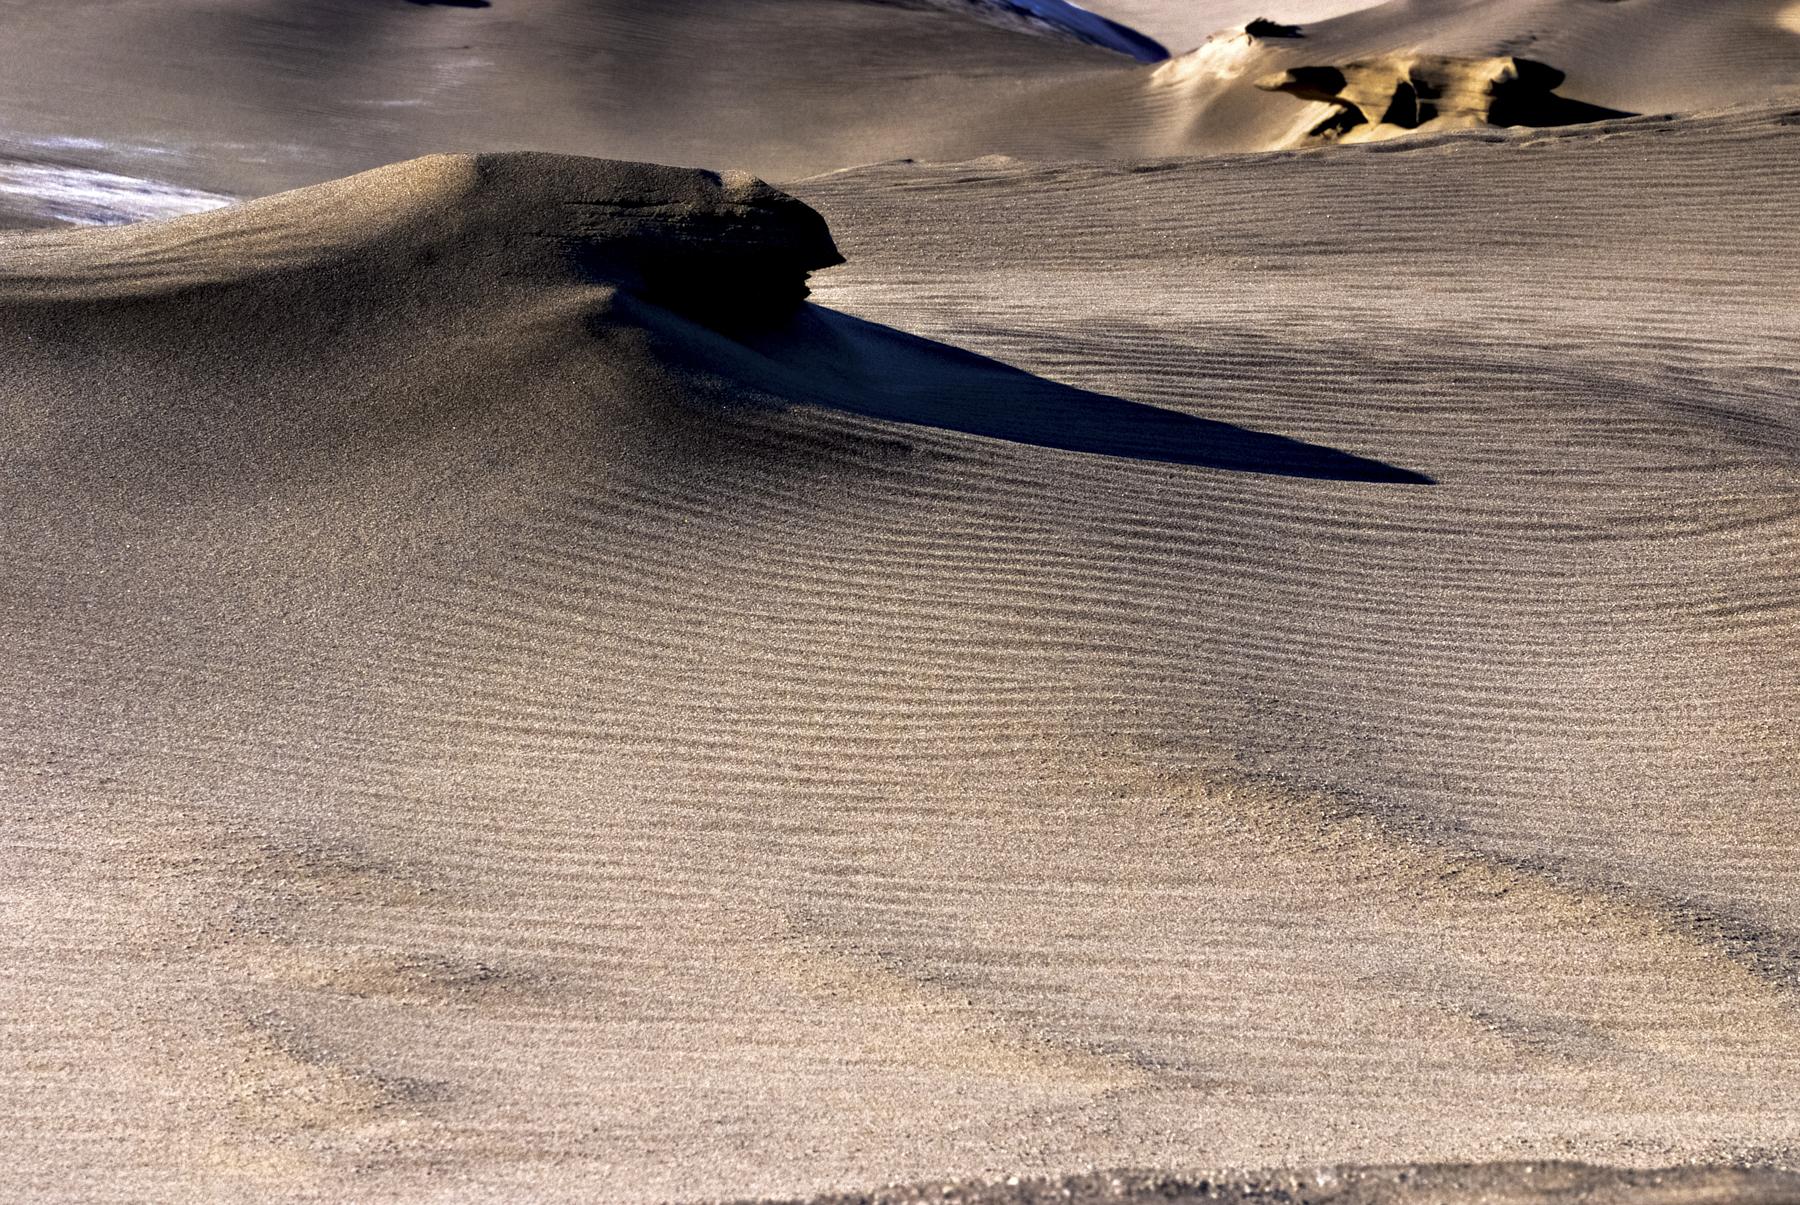 Restricted Zone, Victoria Valley Sand Dunes